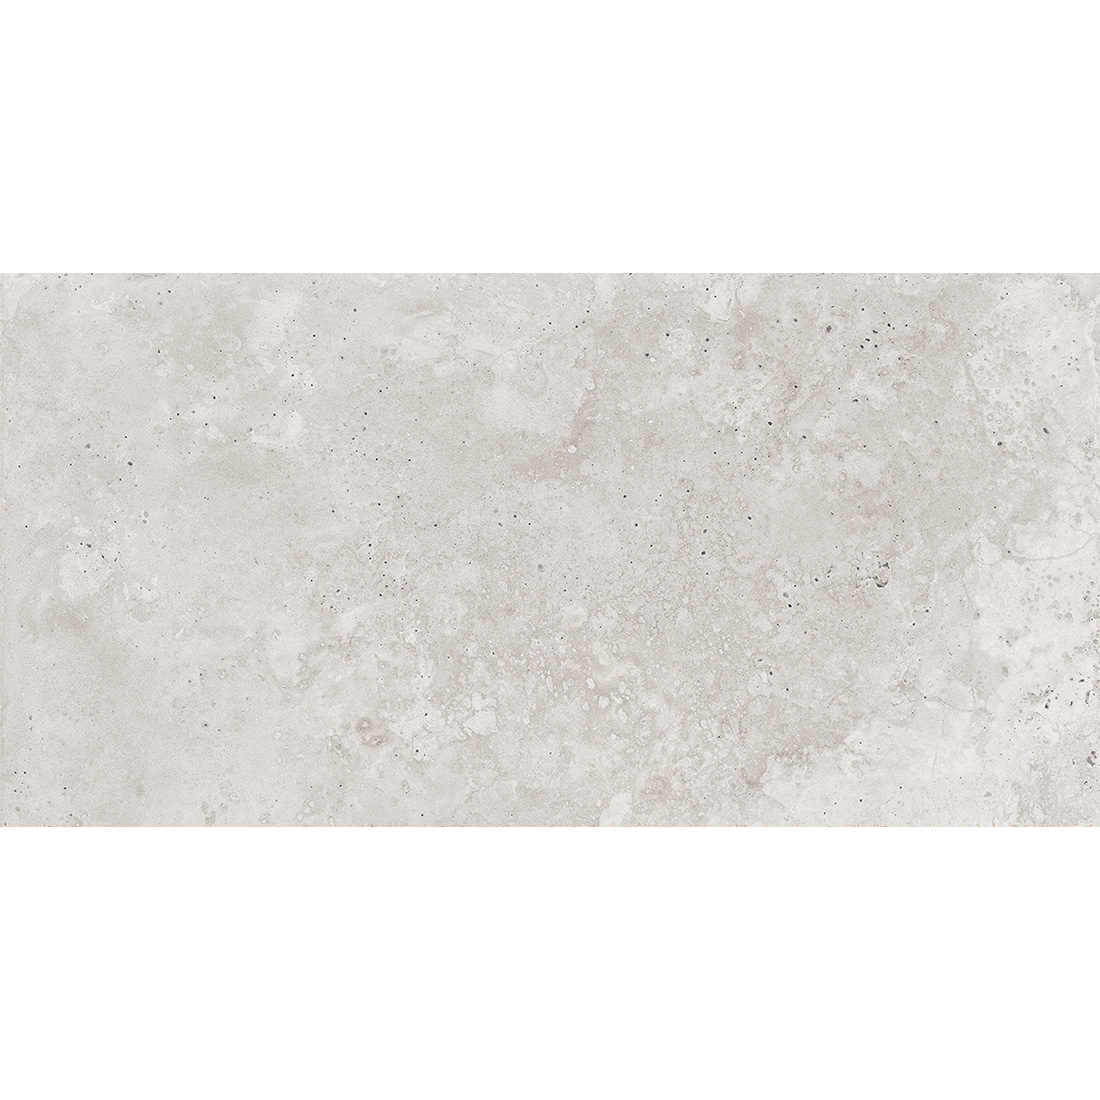 Roma 30x60 Bianco Gloss 1